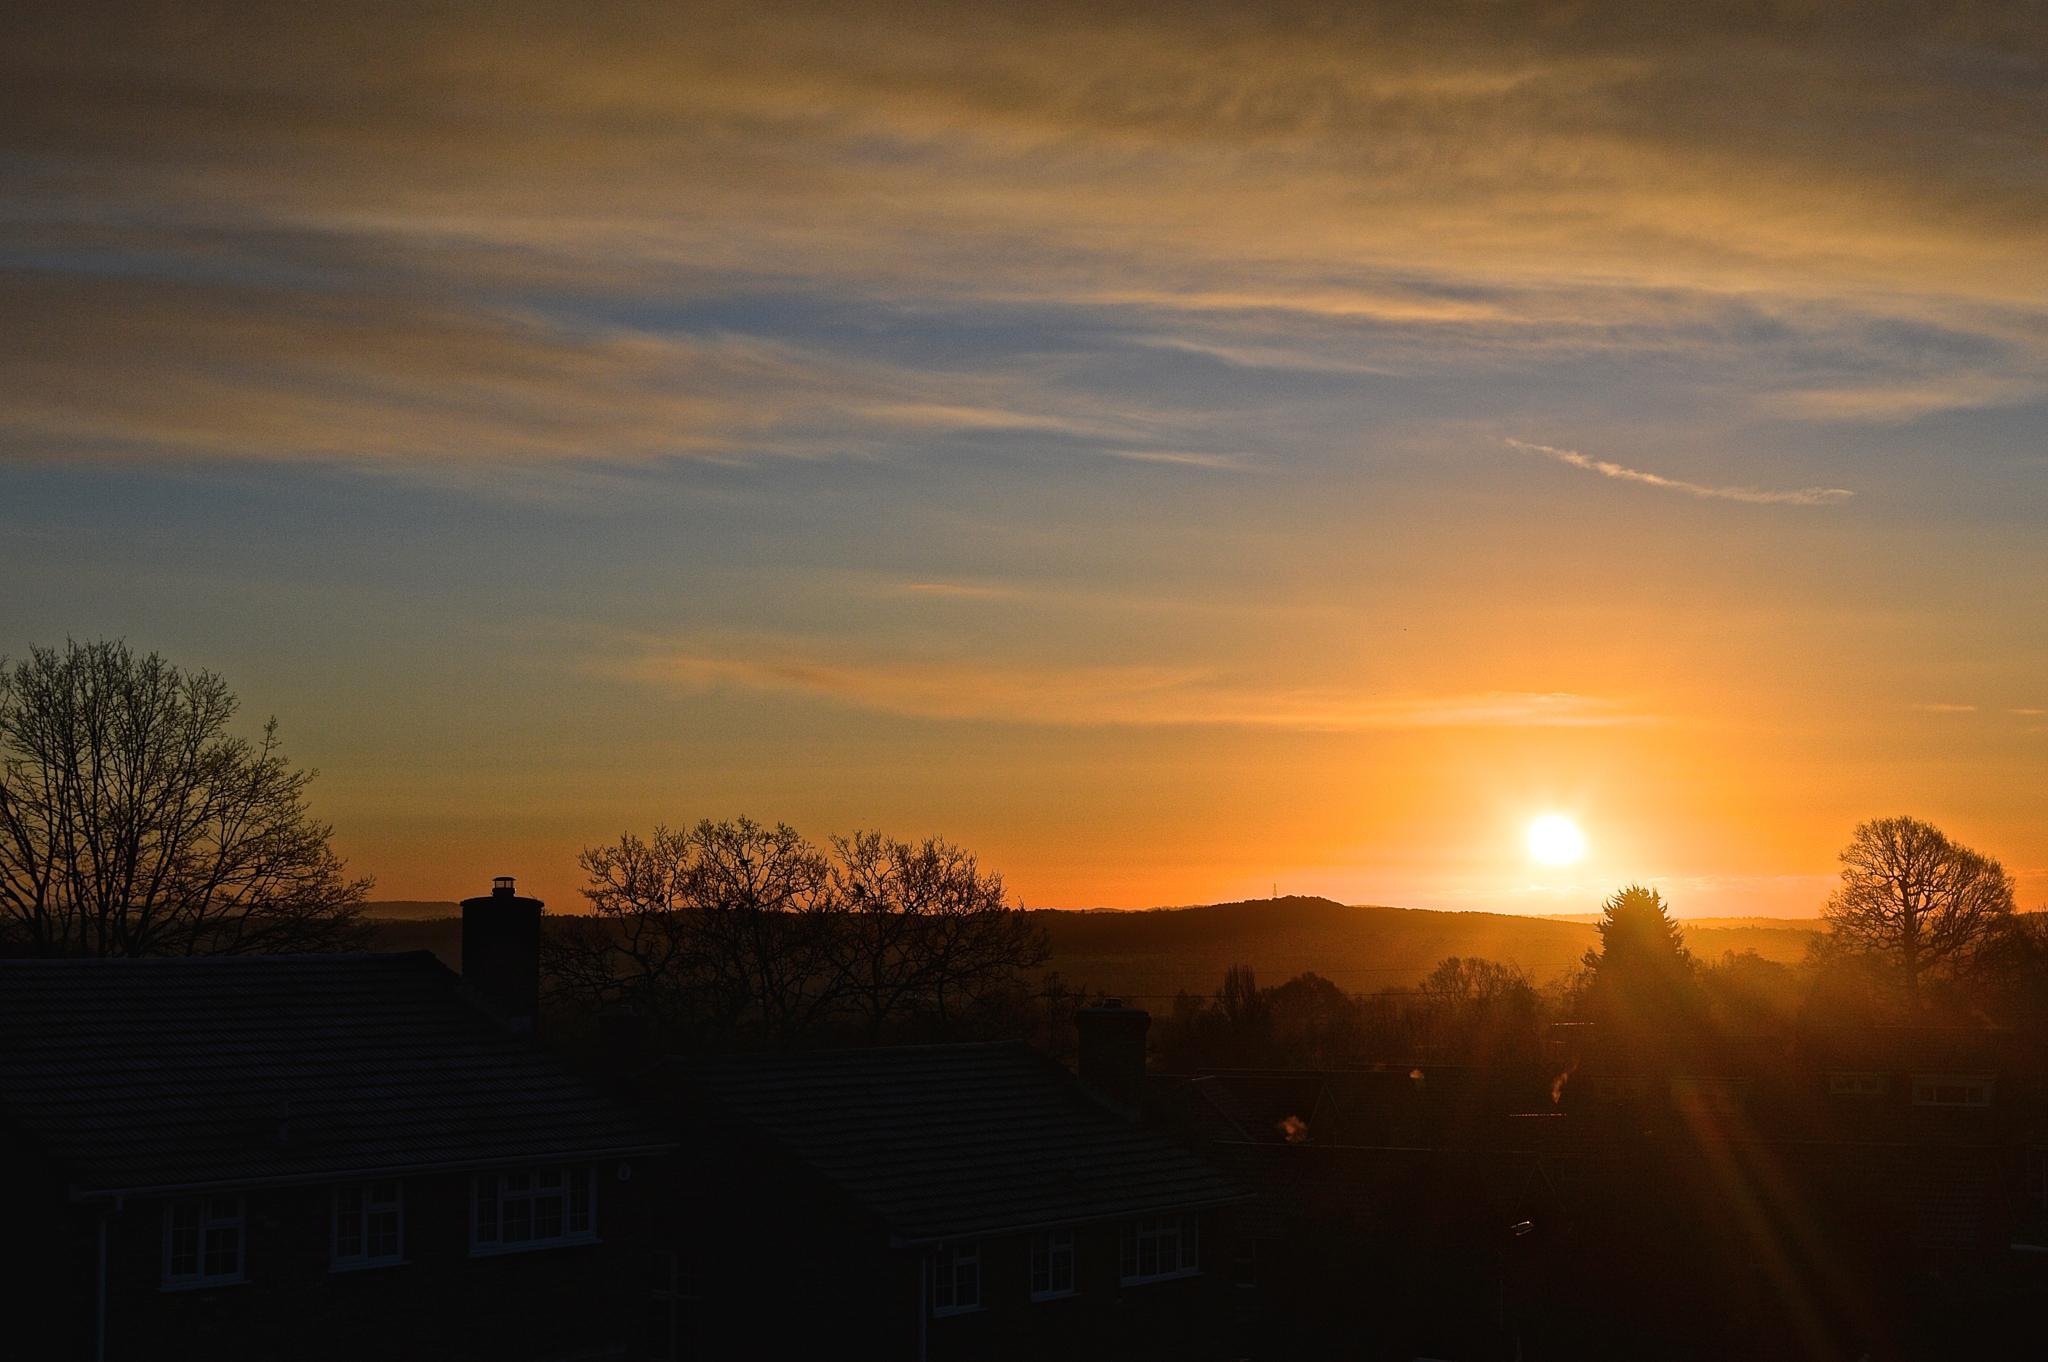 Sunrise by Soonbesummer